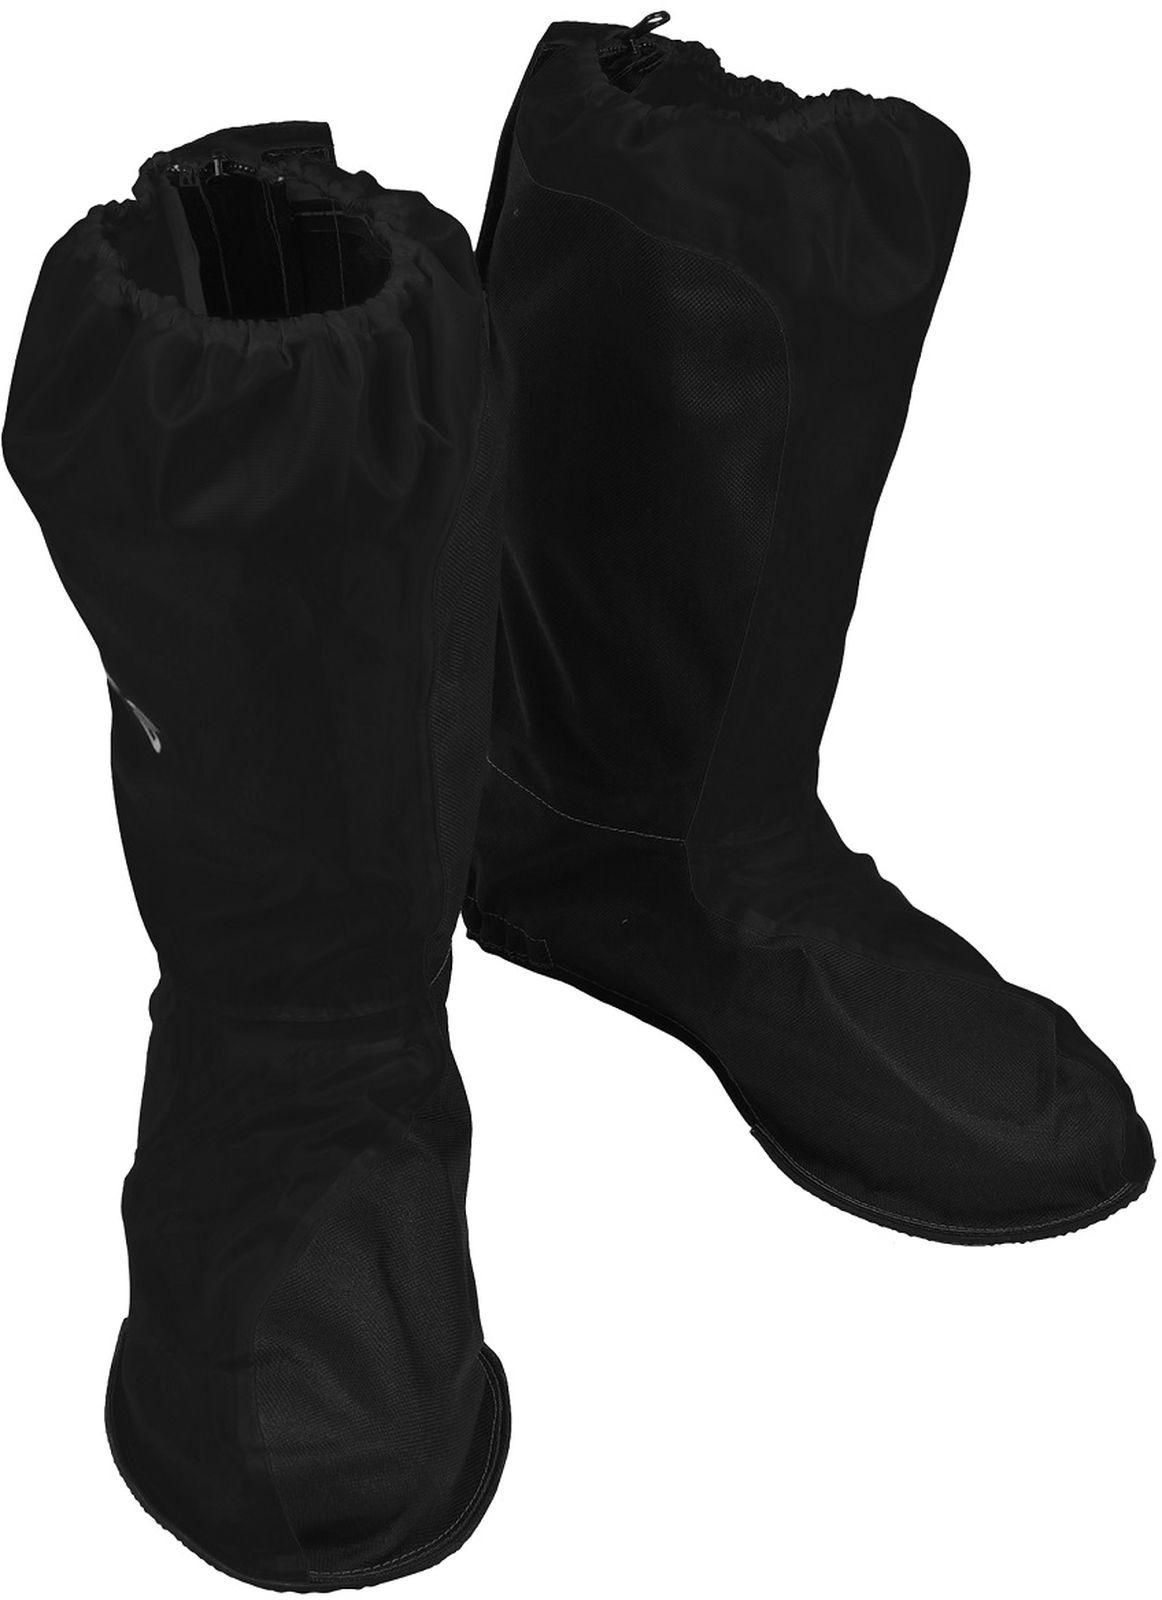 Мотодождевик Starks Rain Boots, LC0054, черный, размер M